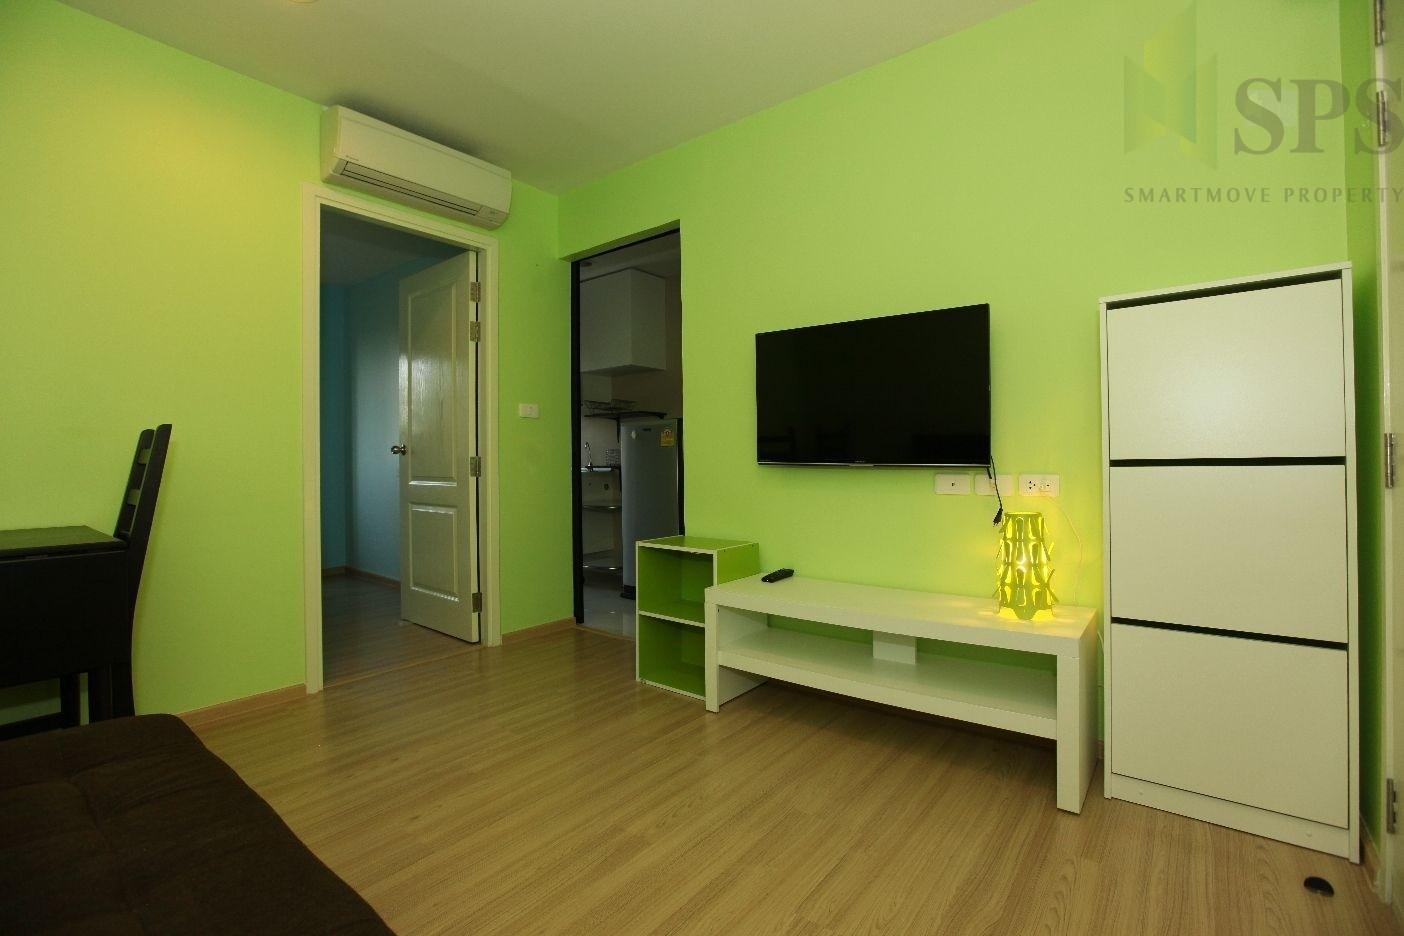 For Rent Condo 1 bed Sukhumvit 109 (SPSEVE-C366)